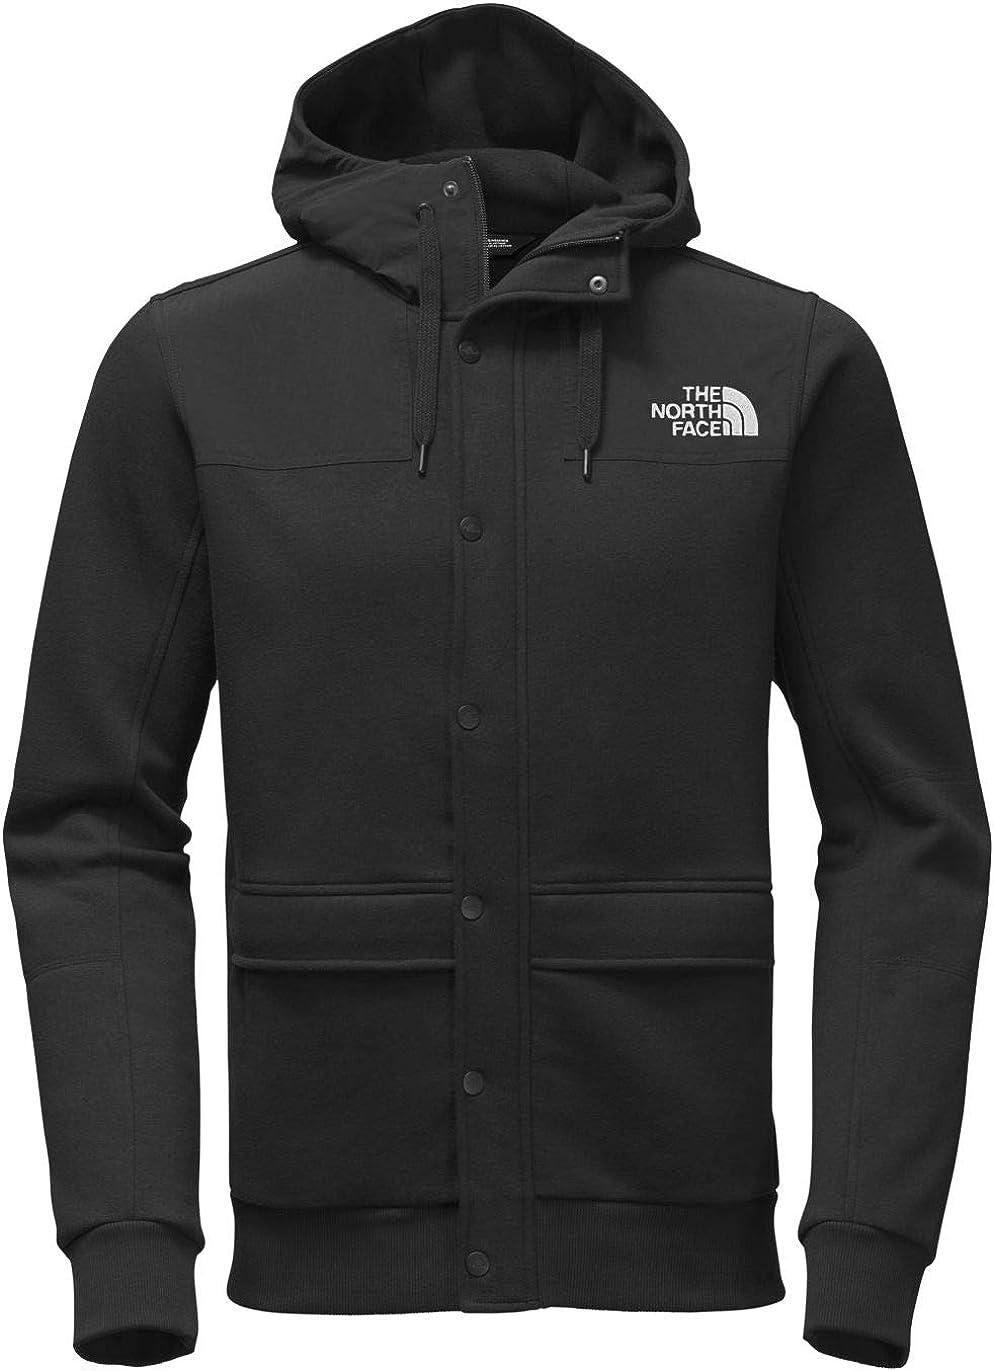 The North Face Men's Rivington Jacket II